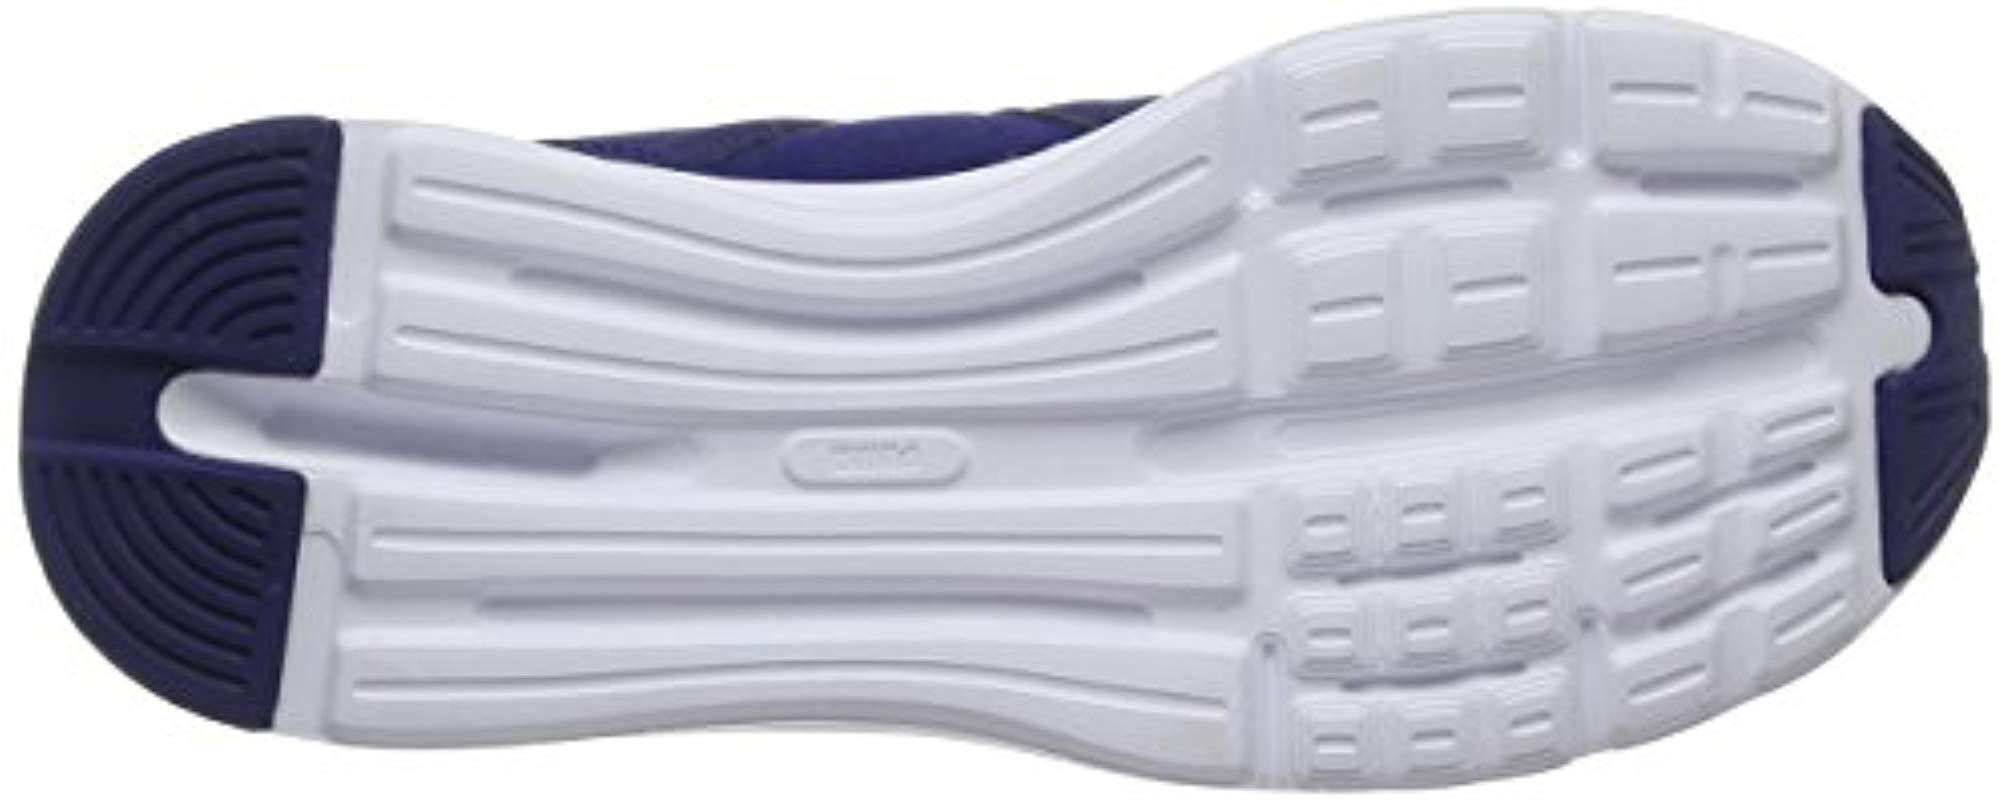 ae513a62cf4c PUMA - Blue Enzo Mesh Running Shoes (190015) for Men - Lyst. View fullscreen